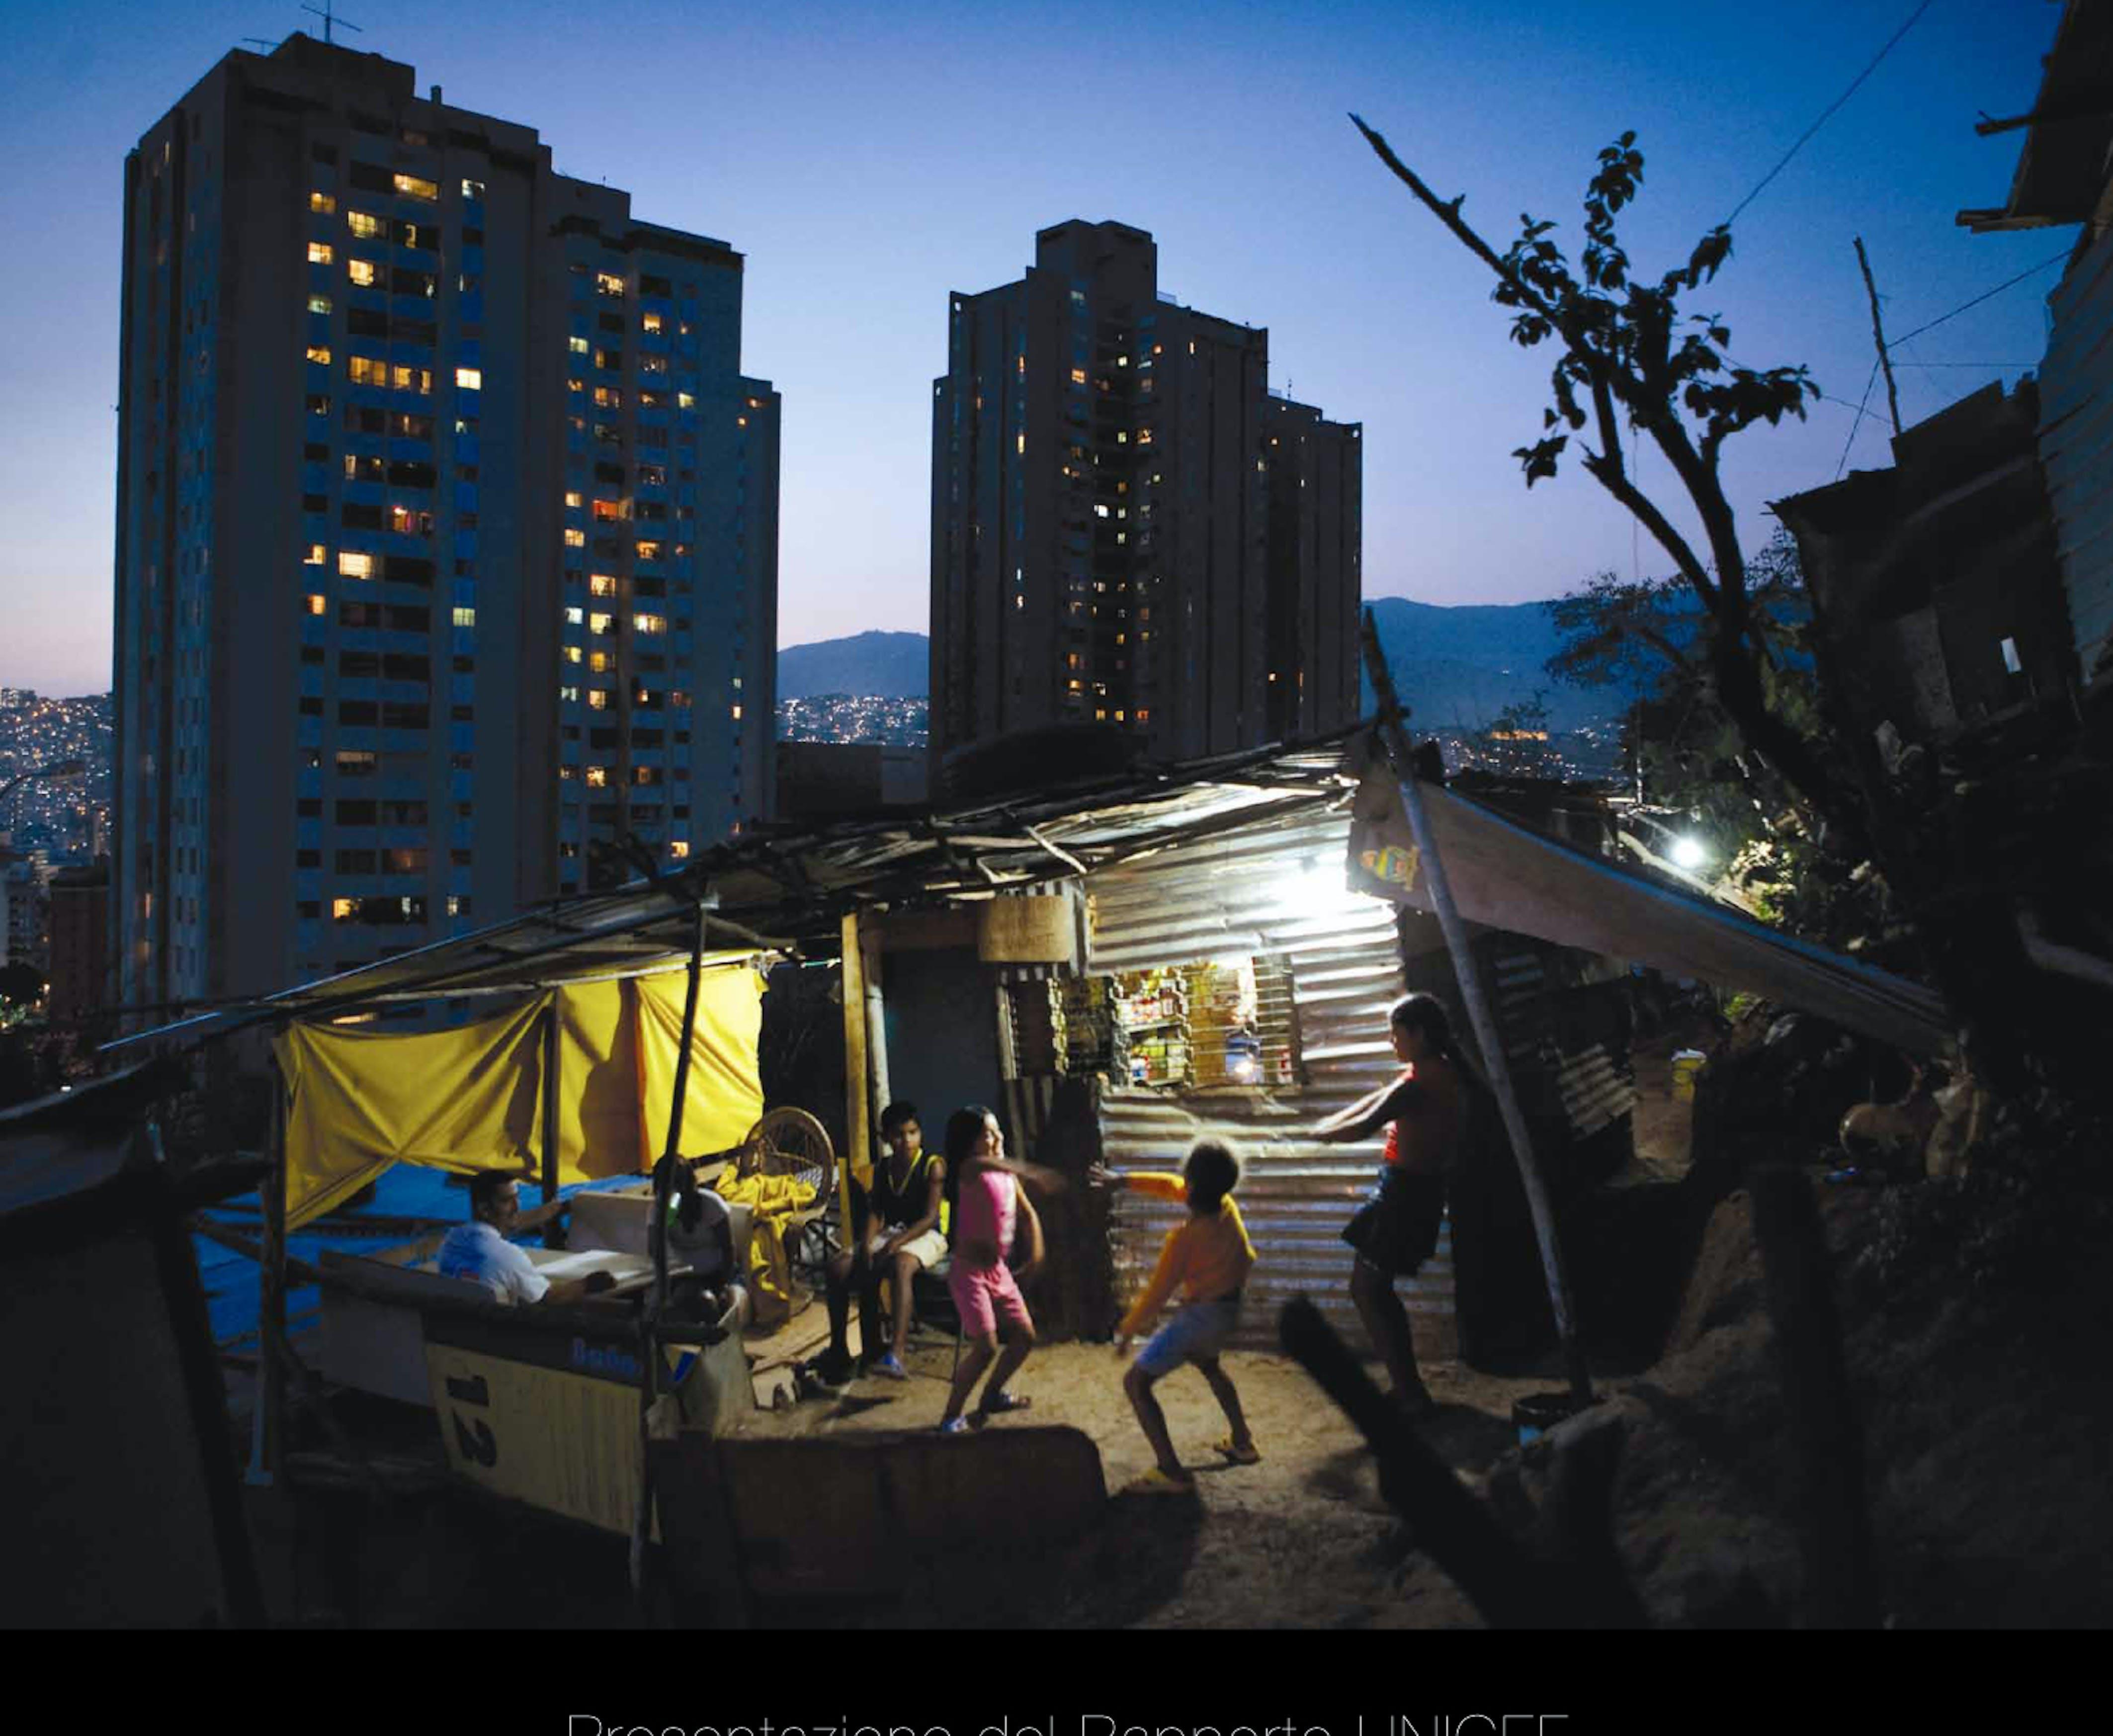 Bambini giocano in una favela a Caracas (Venezuela) - ©Jonas Bendiksen/Magnum Photos/2007